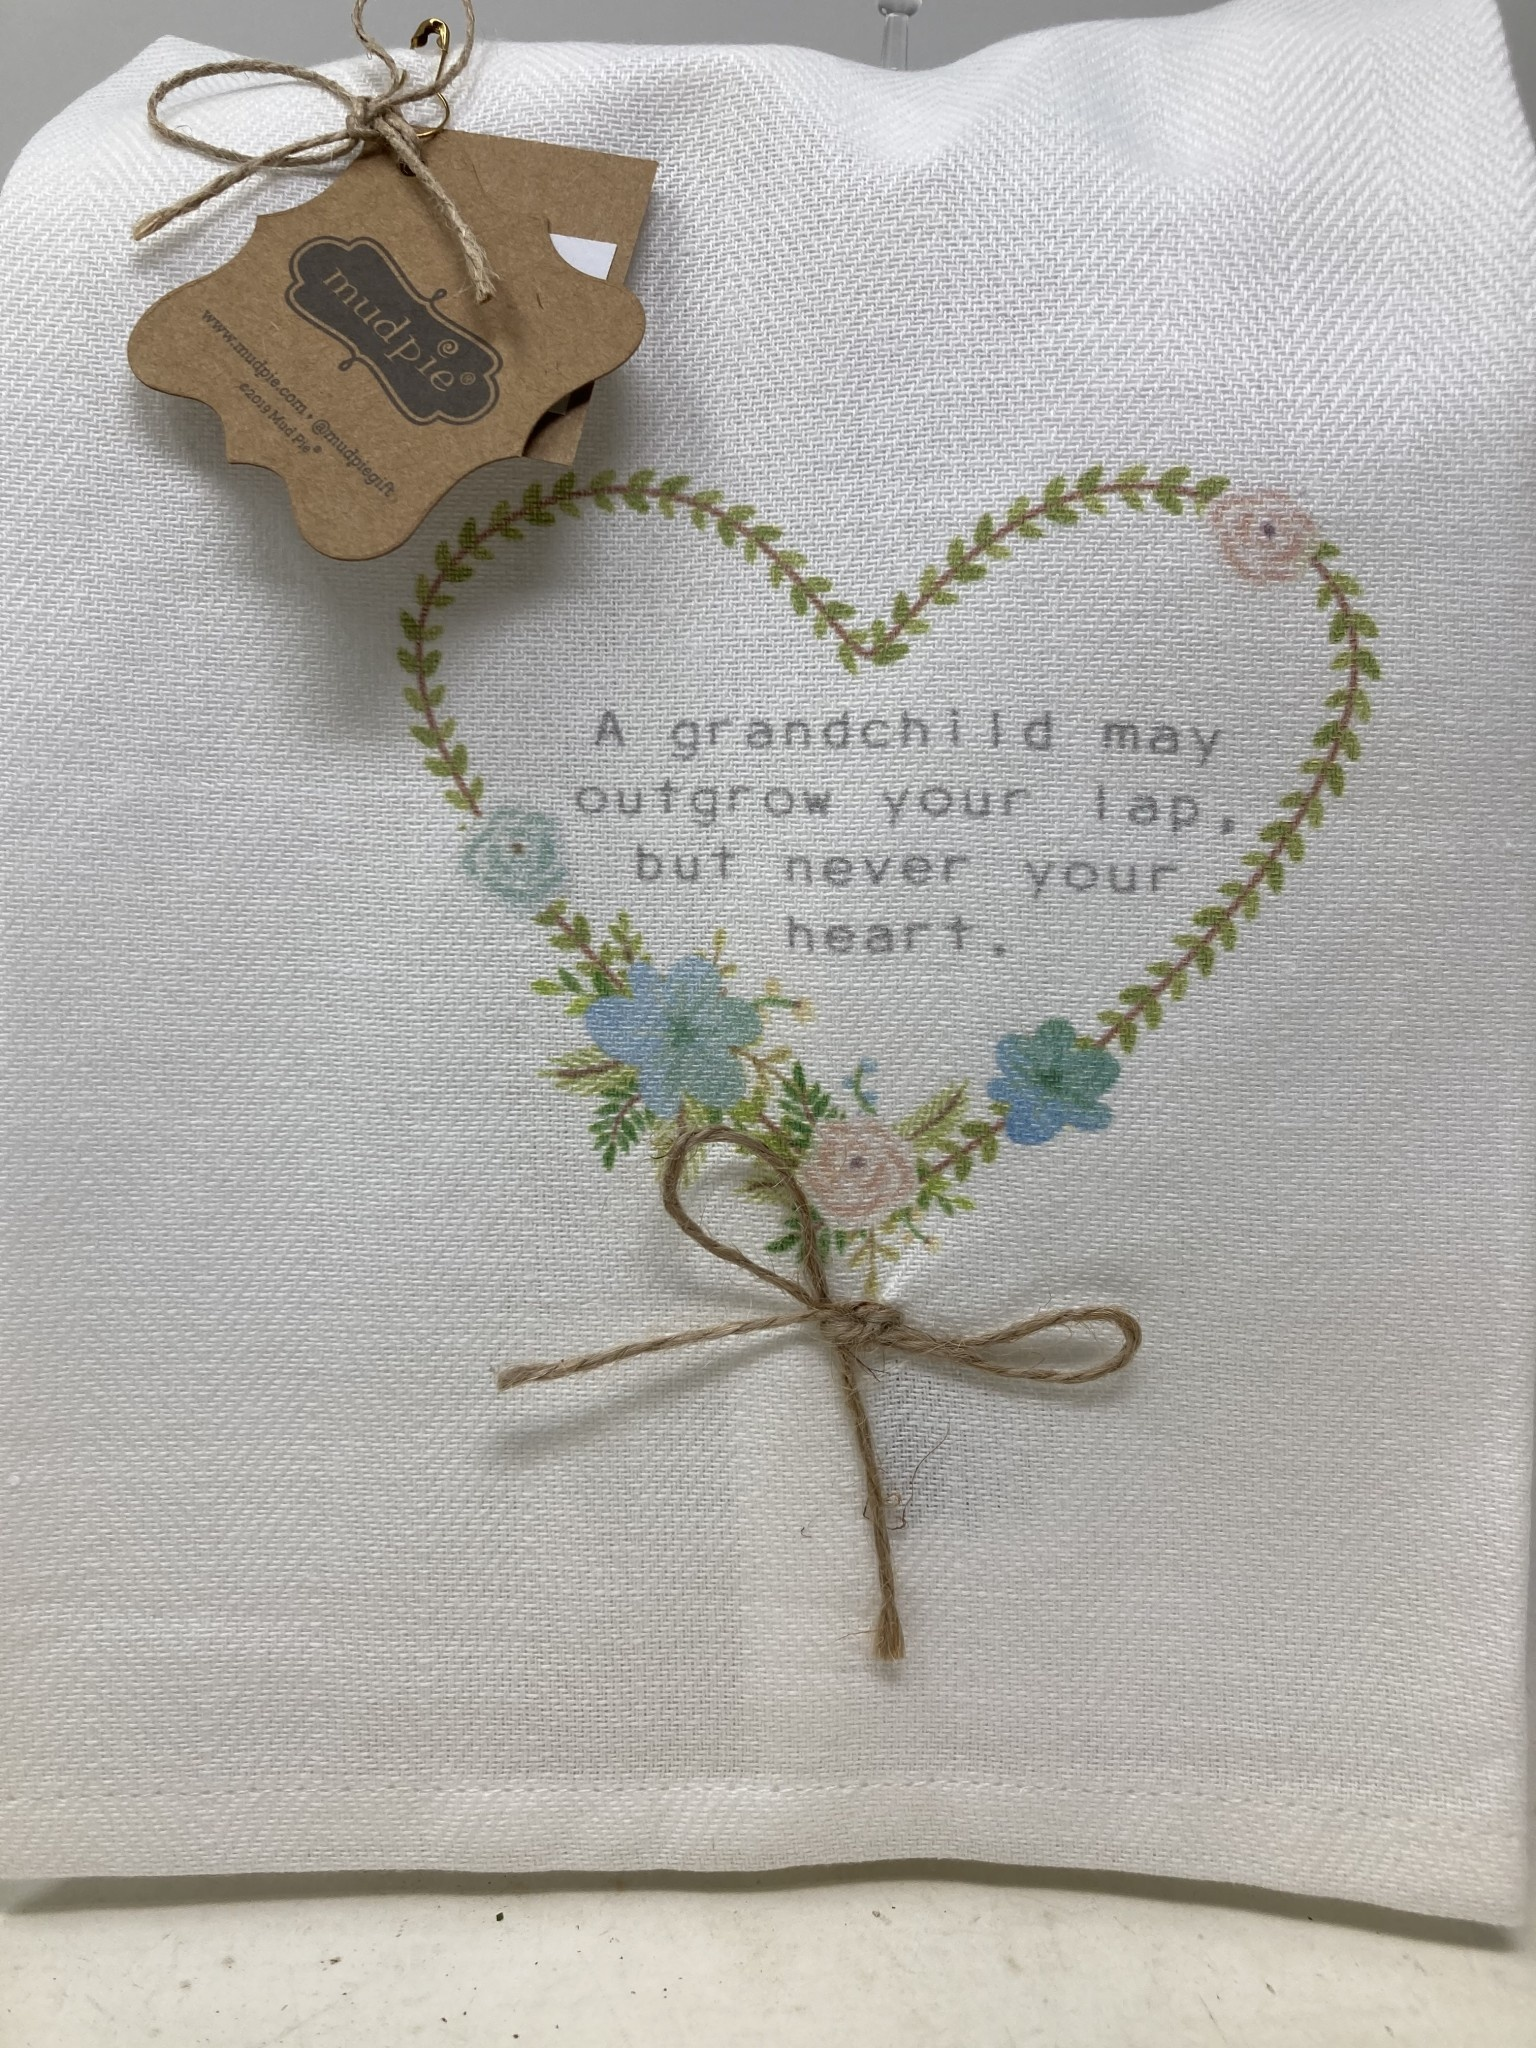 A Grandchild Heart Tea Towel